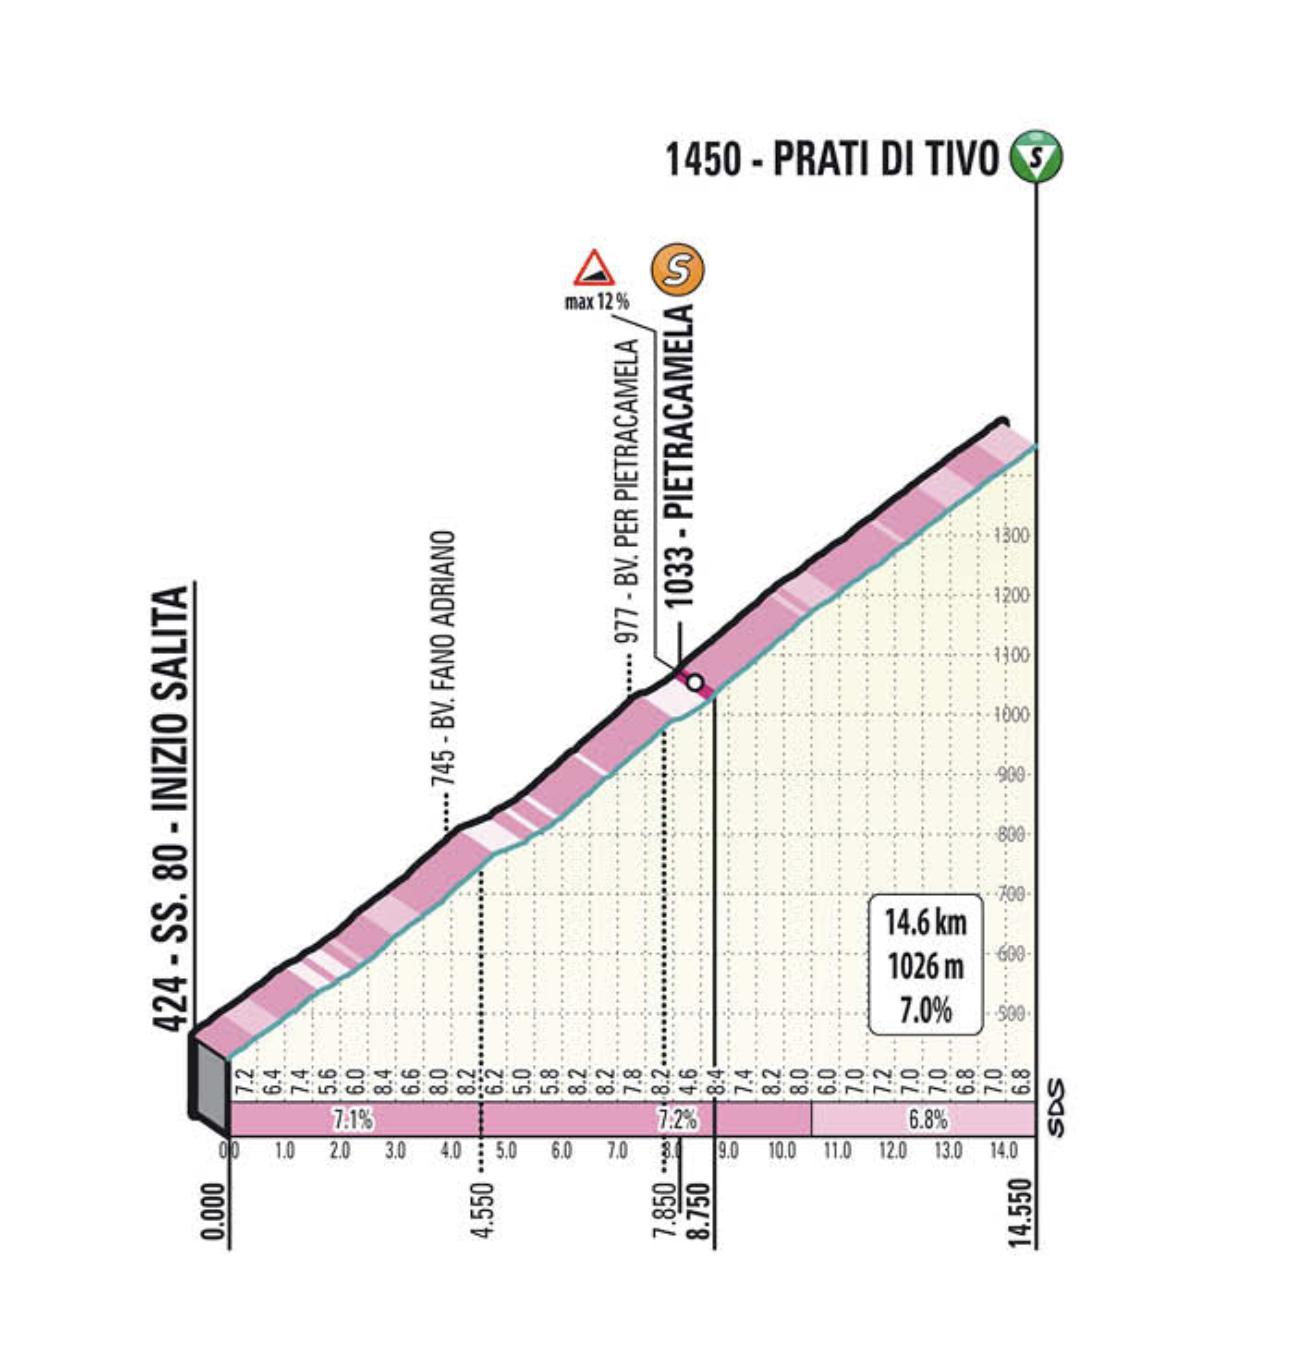 Tirreno 2021 stage 4 climb 2